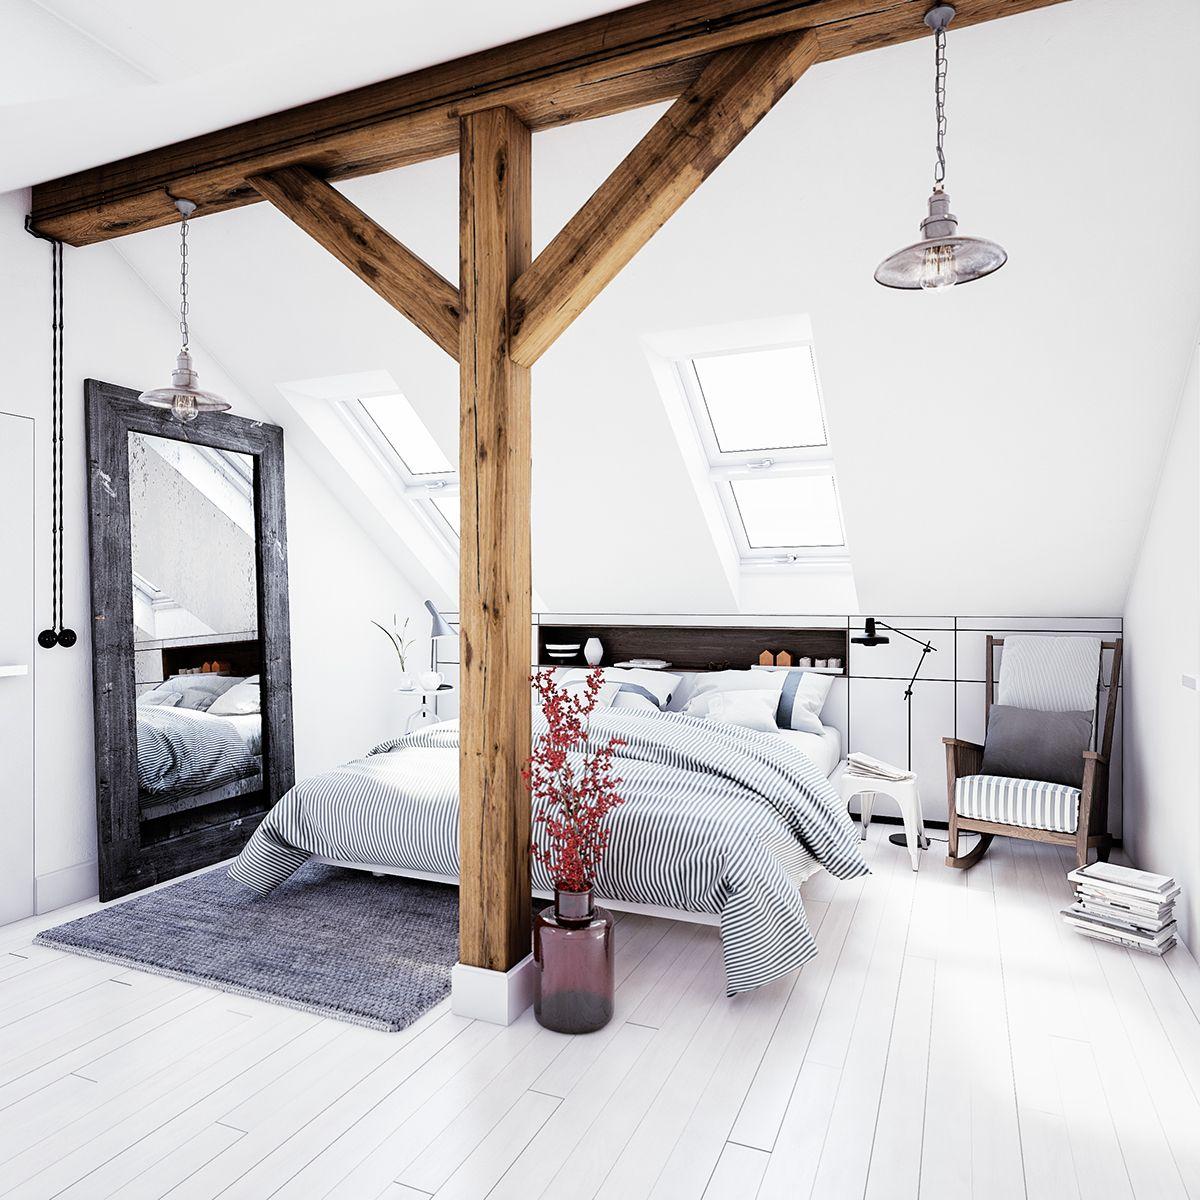 500 Custom Master Bedroom Design Ideas for 2018   Pinterest   Attic ...